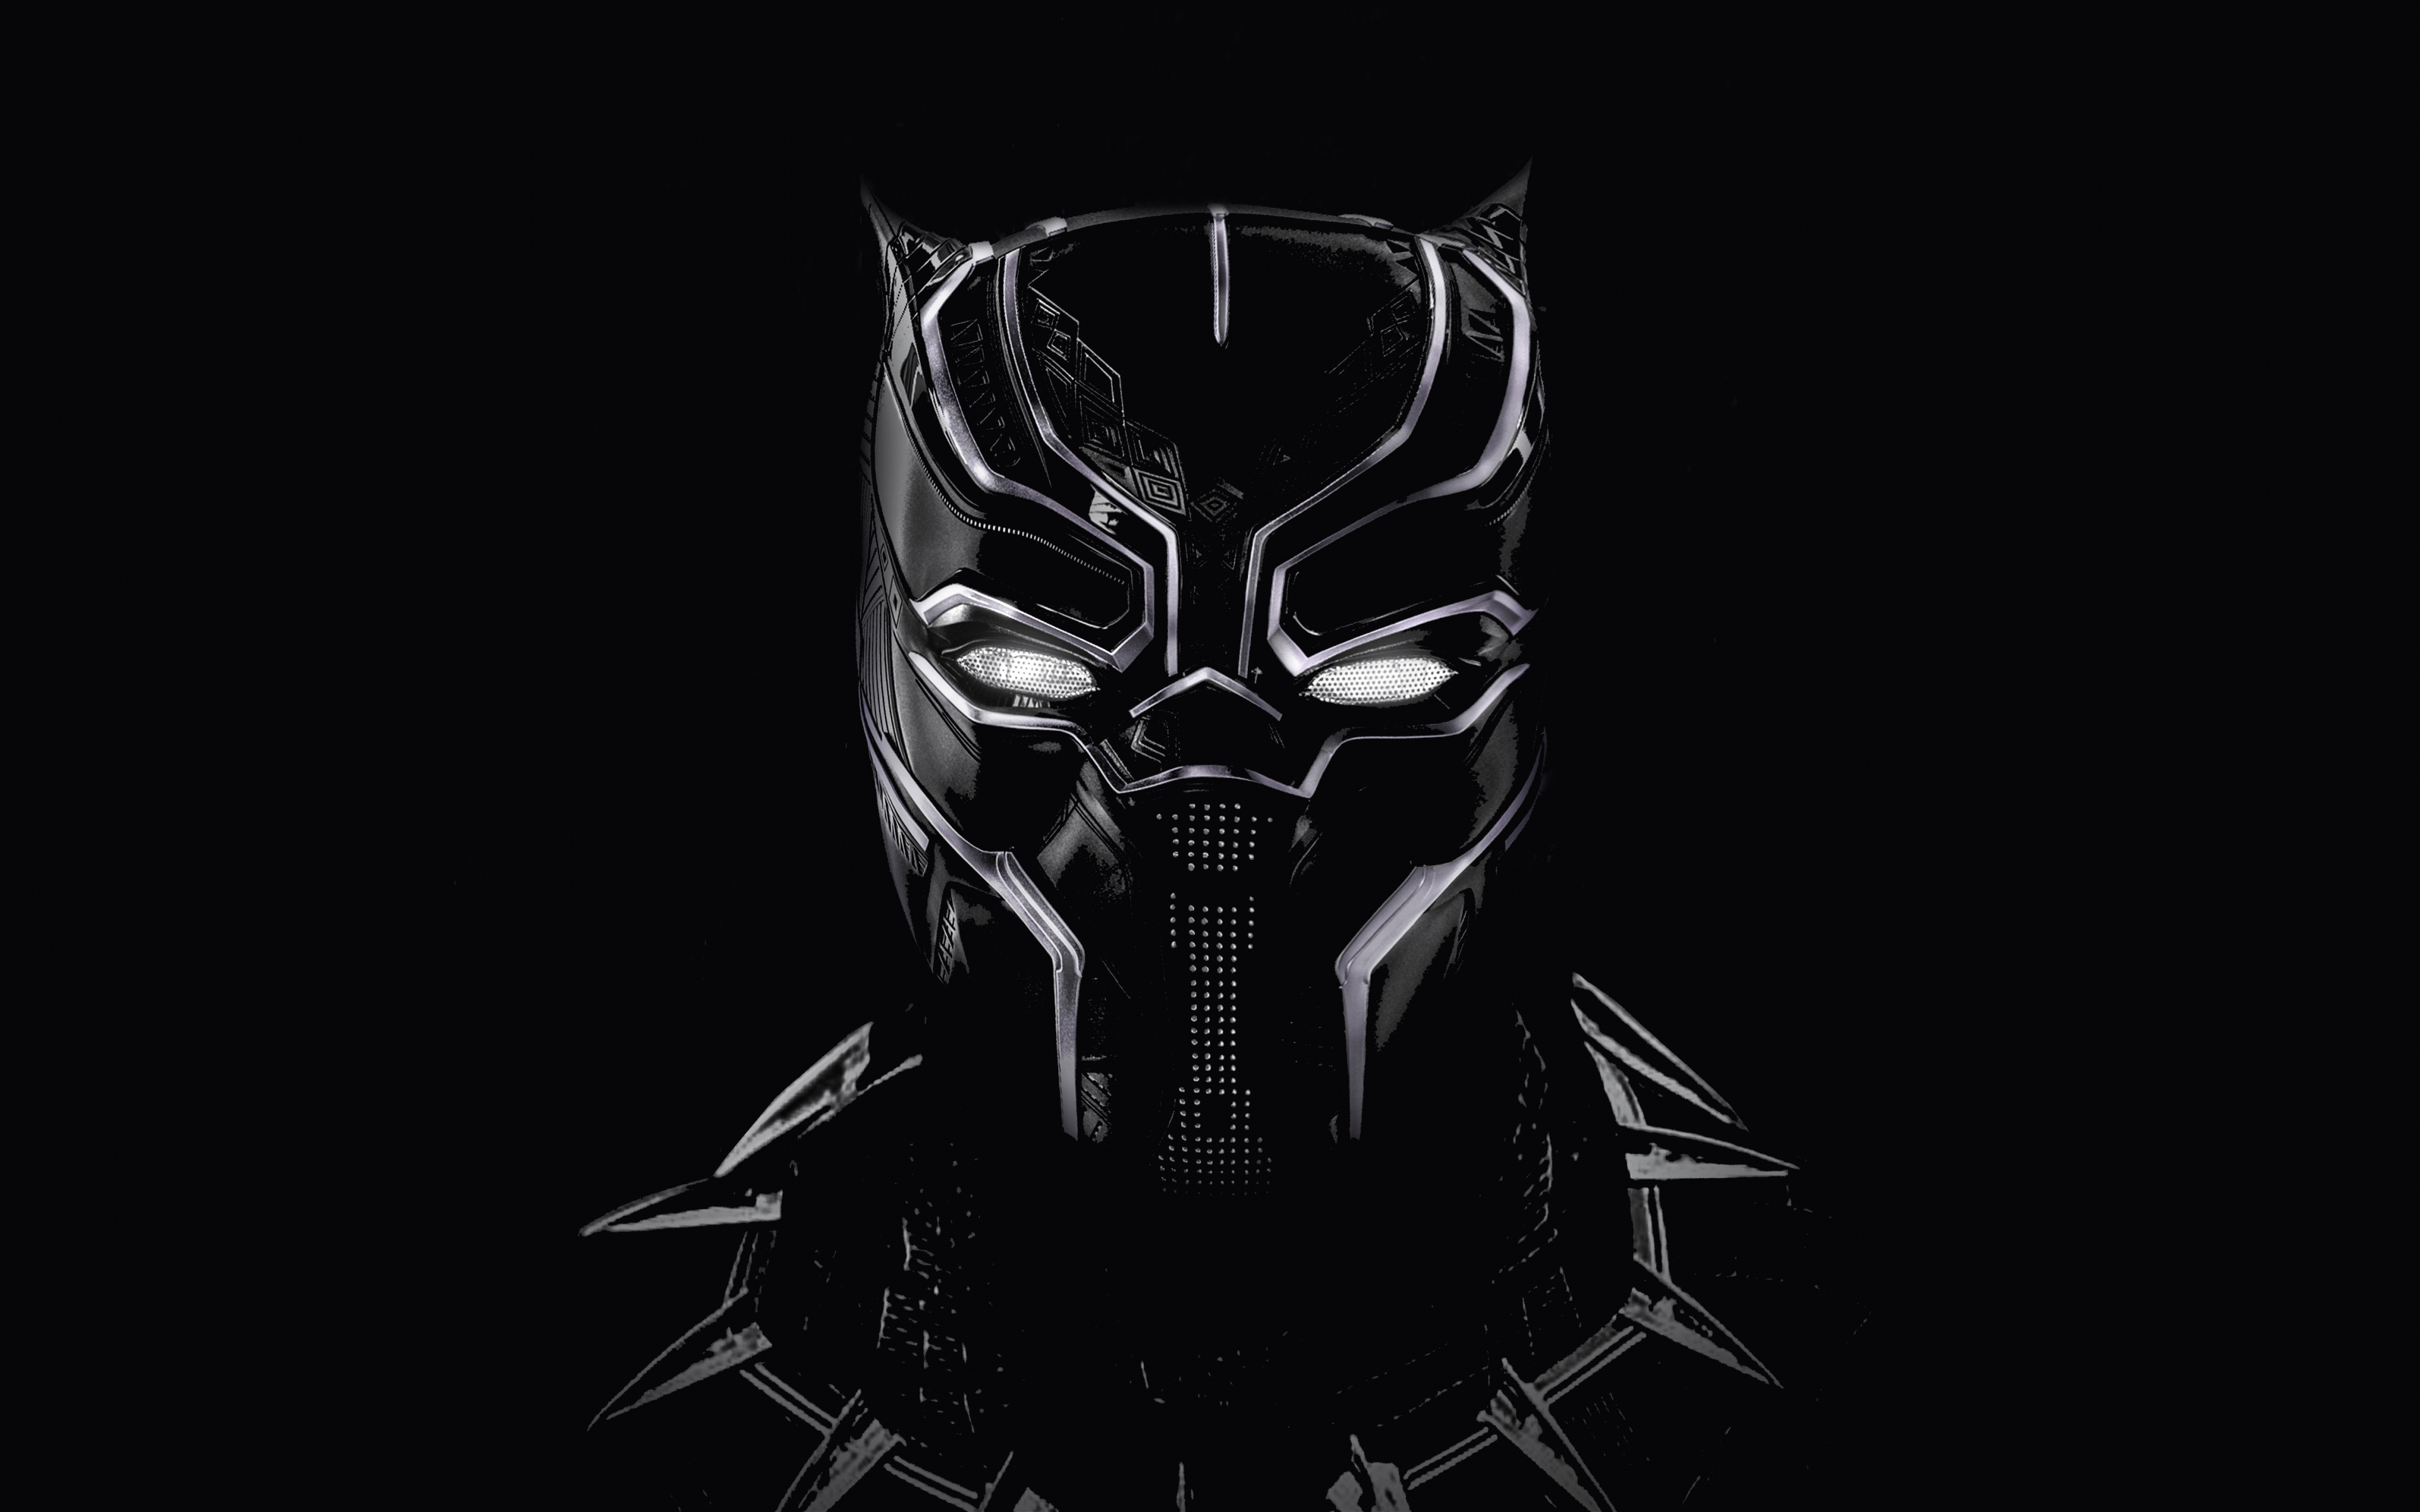 Download 3840x2400 Wallpaper Black Panther Black Mask Artwork 4k